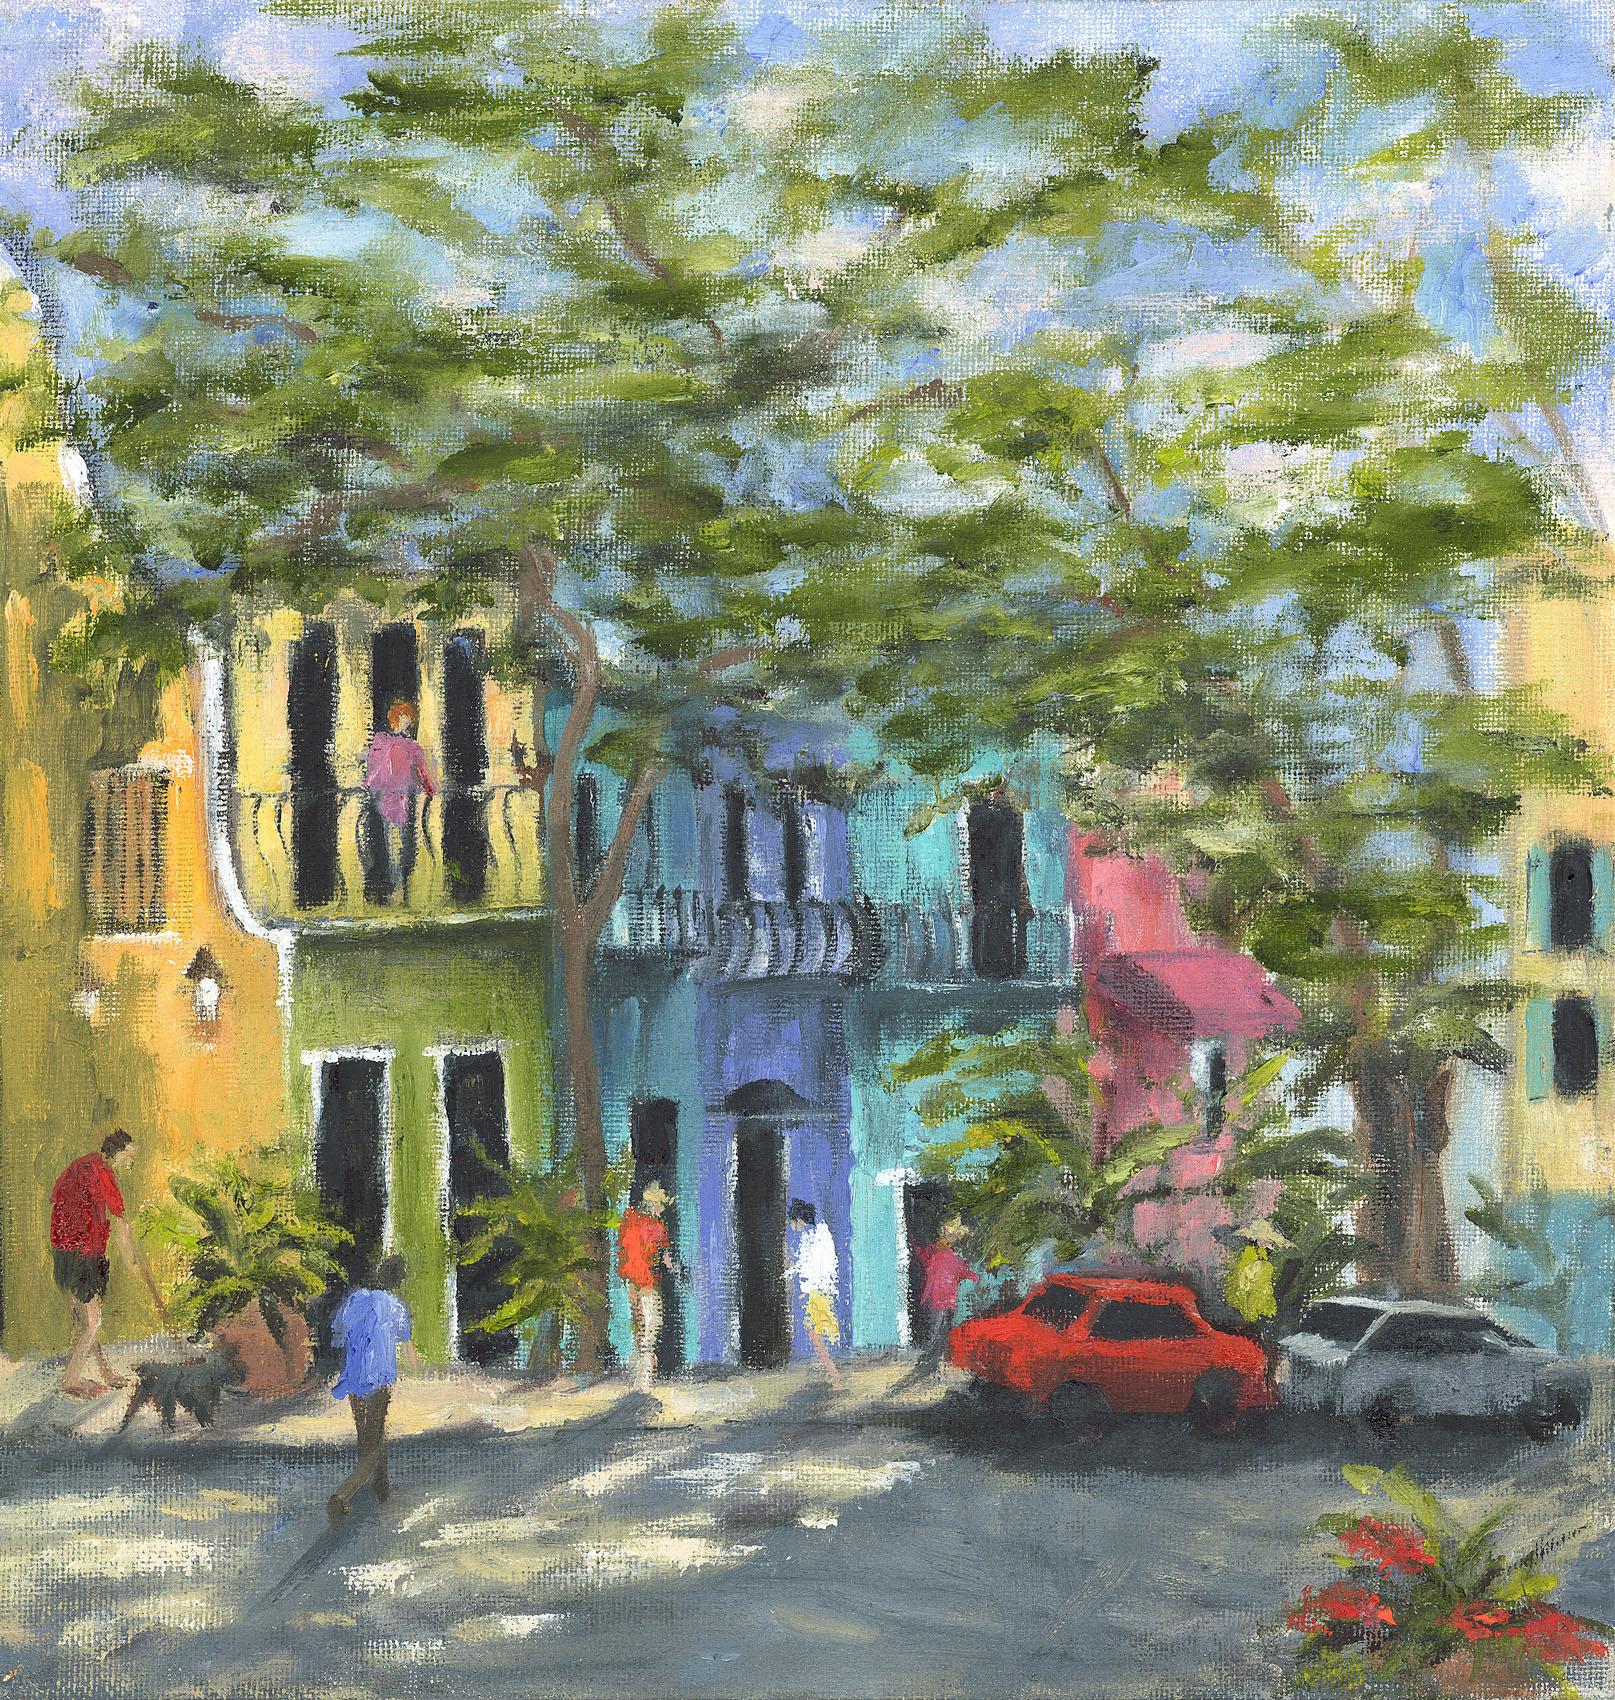 Marla Mullaney - Paintings